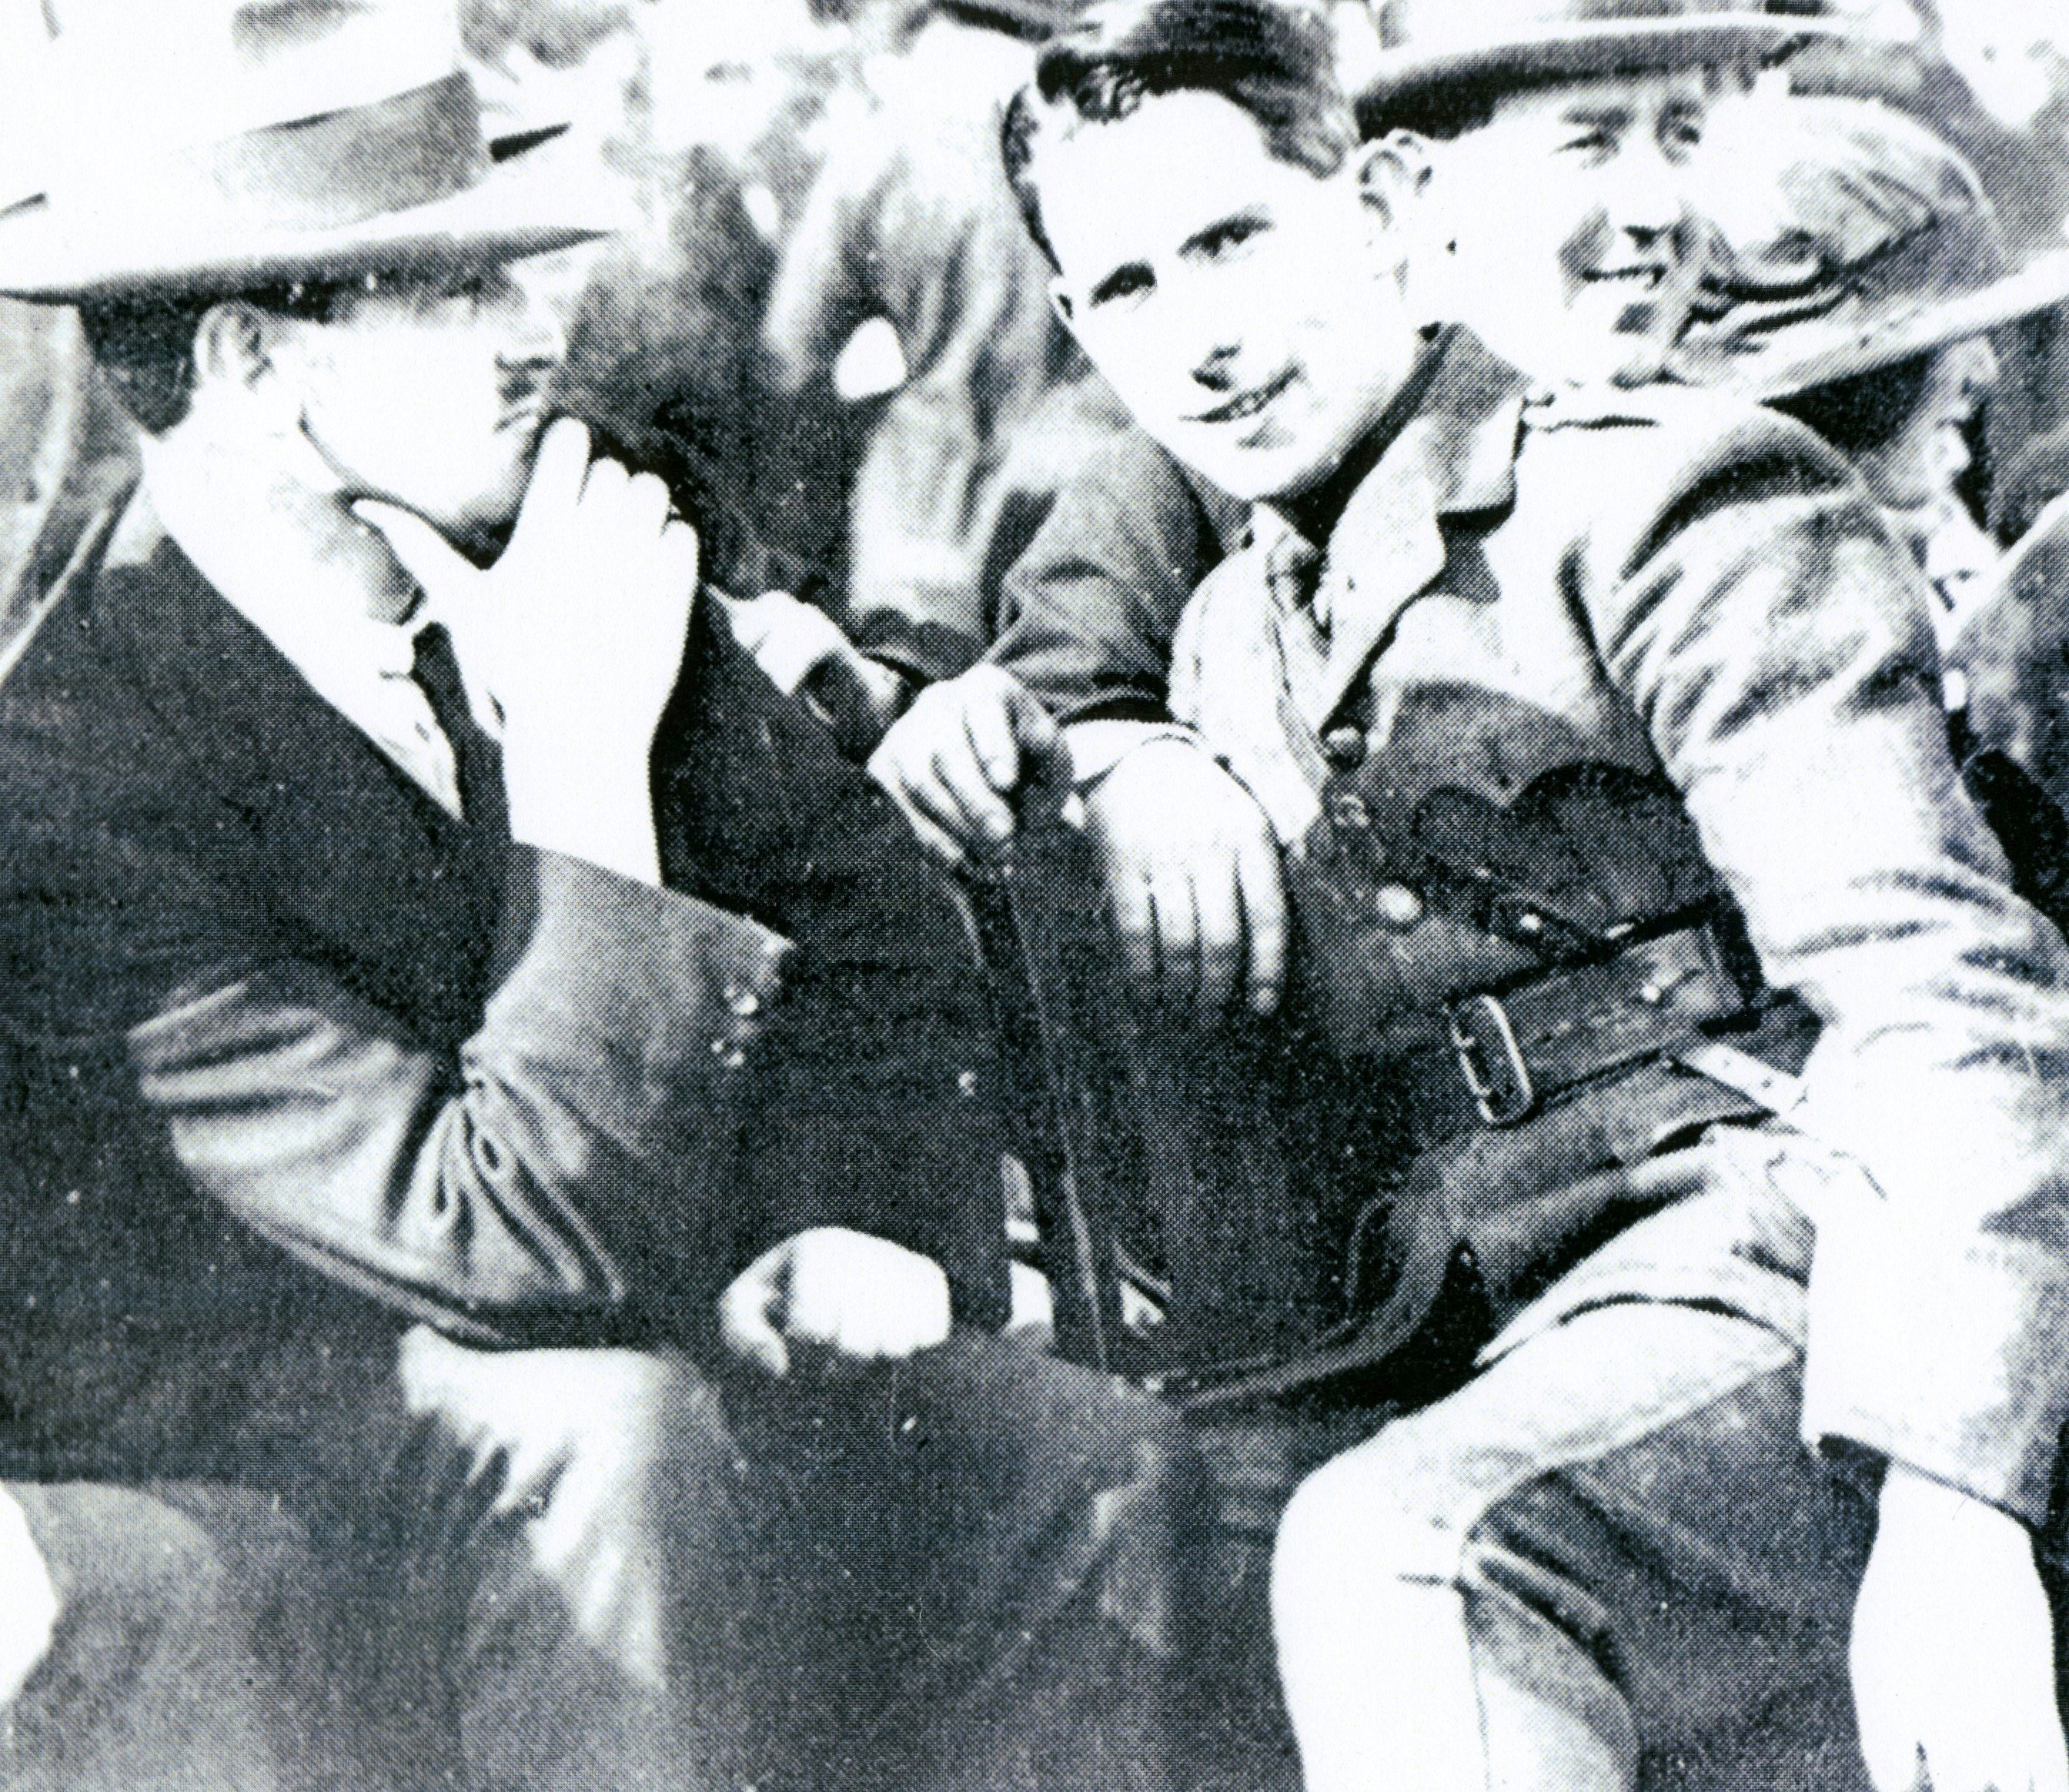 Michael Collins and General McKeown at Croke Park, 1921